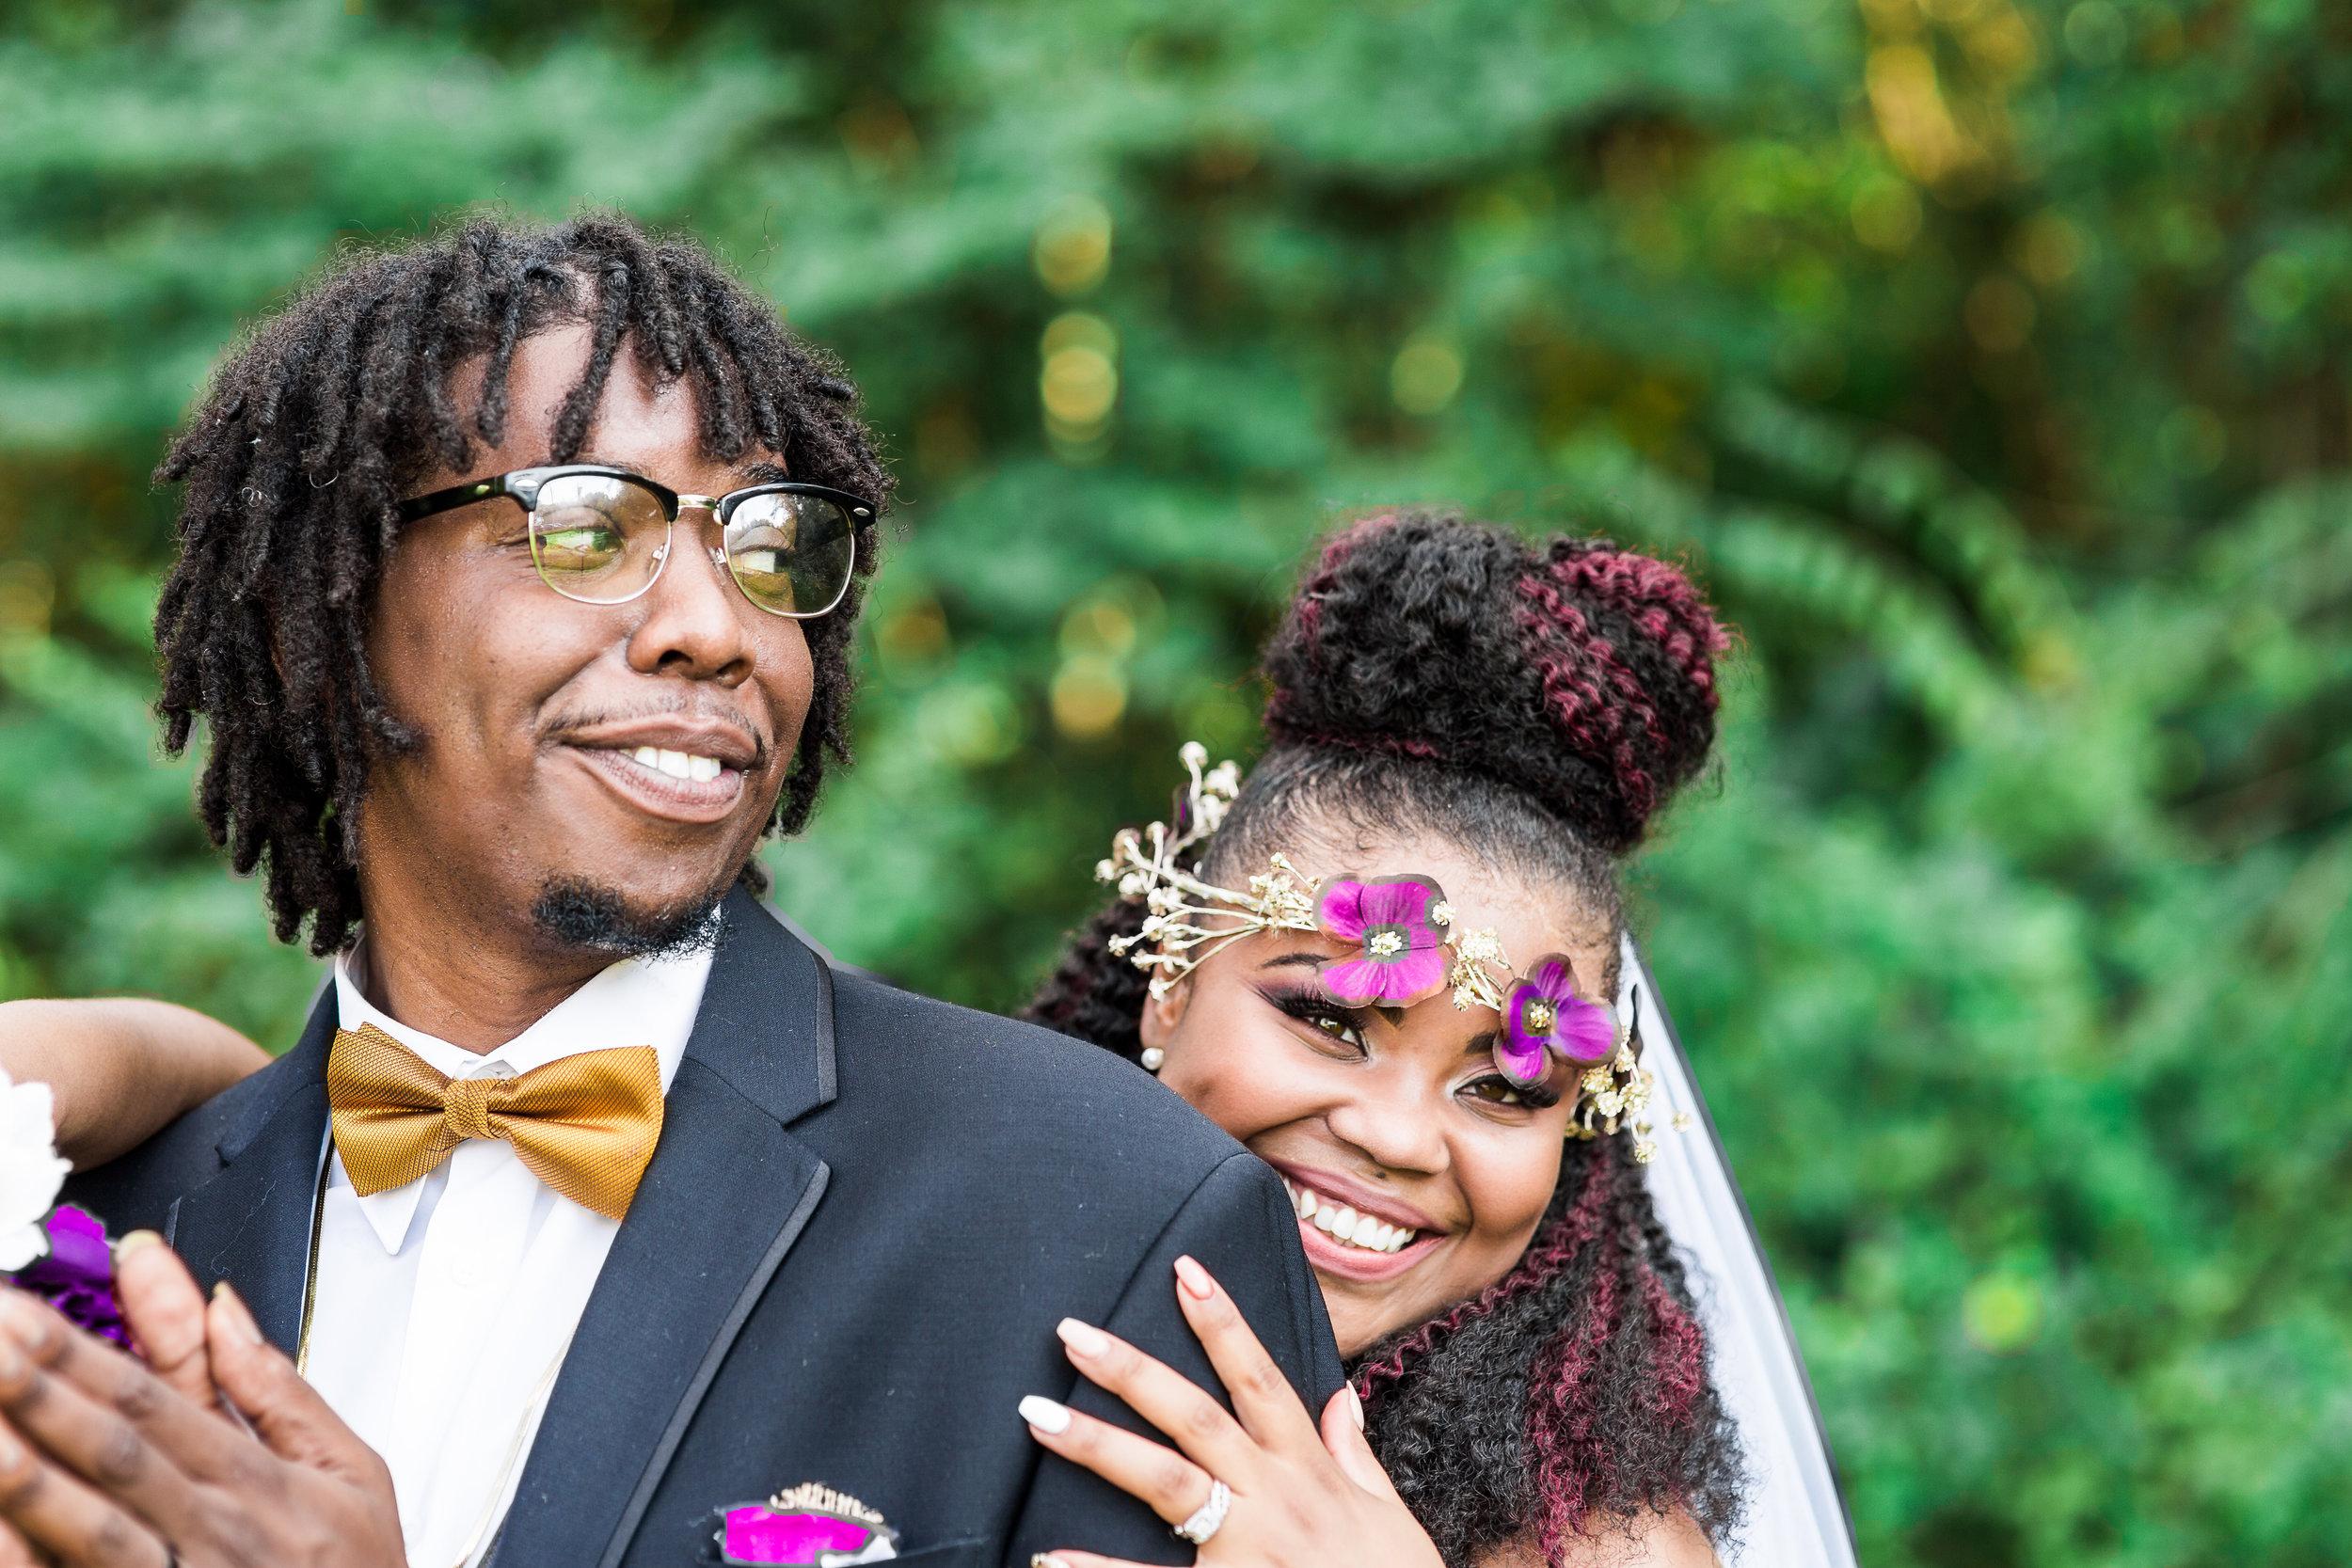 st-louis-wedding-photographer-the-bentleys-kansas-city-205.jpg